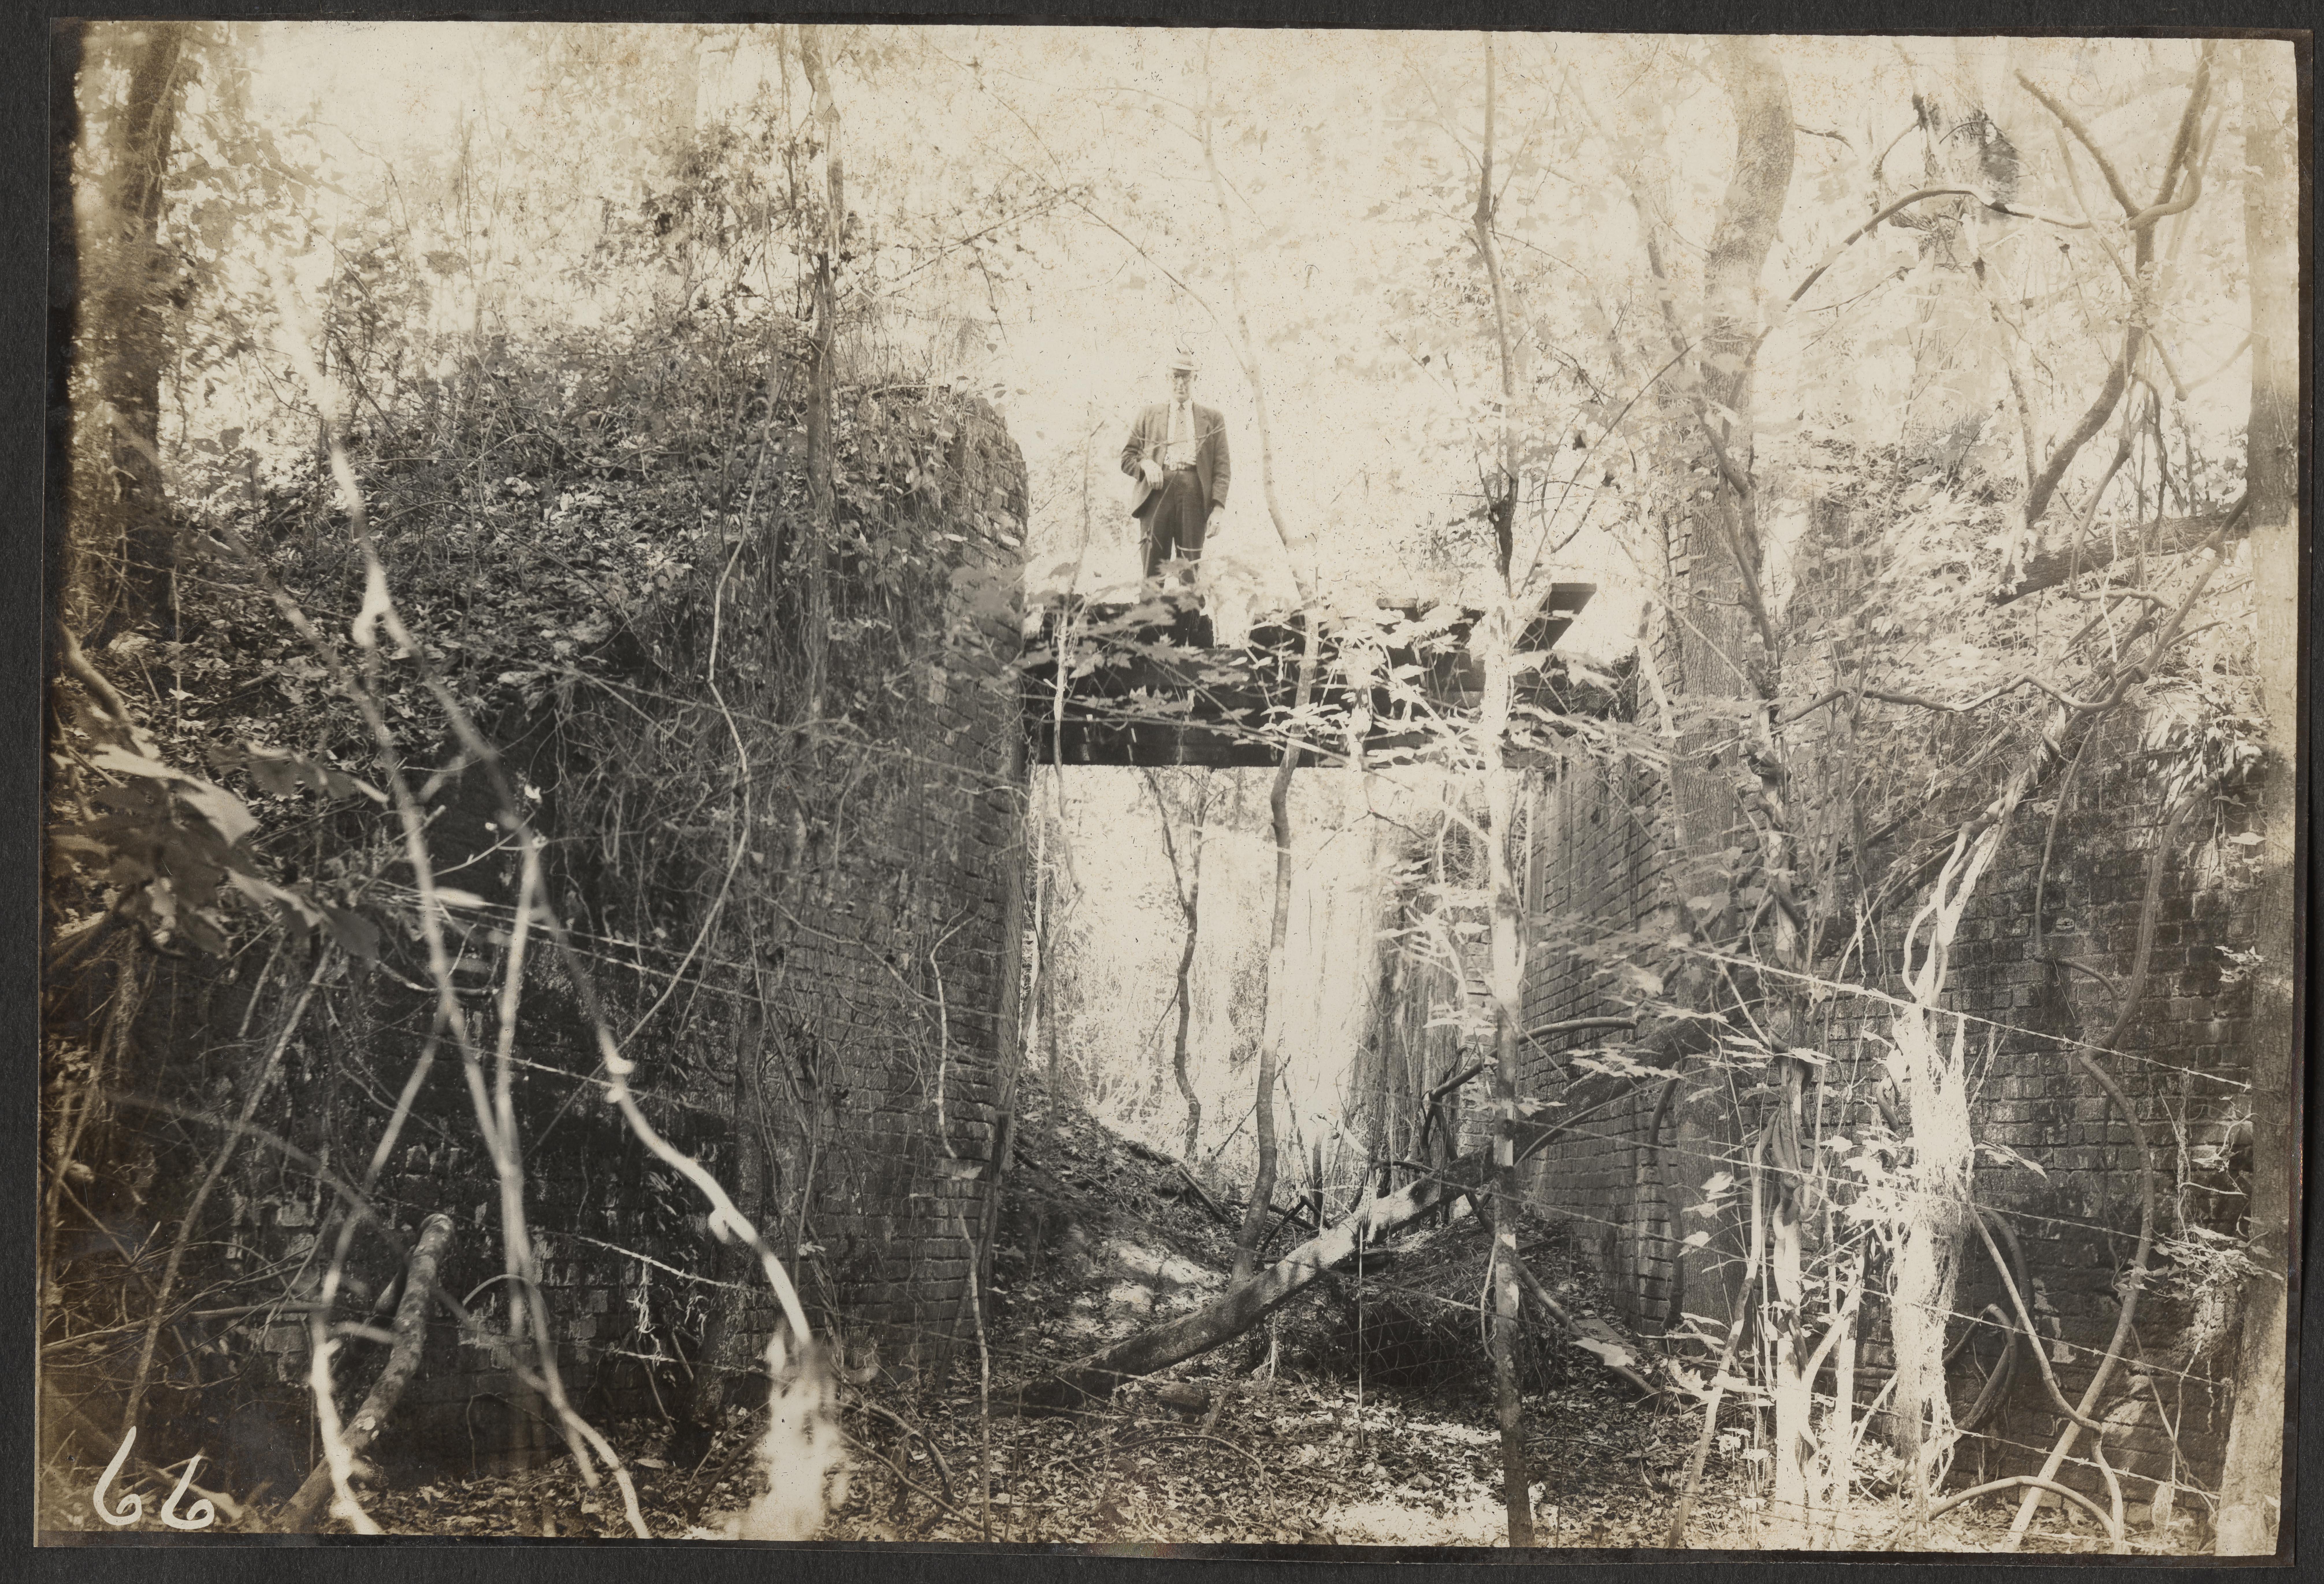 Santee-Cooper Cemetery Investigation 013